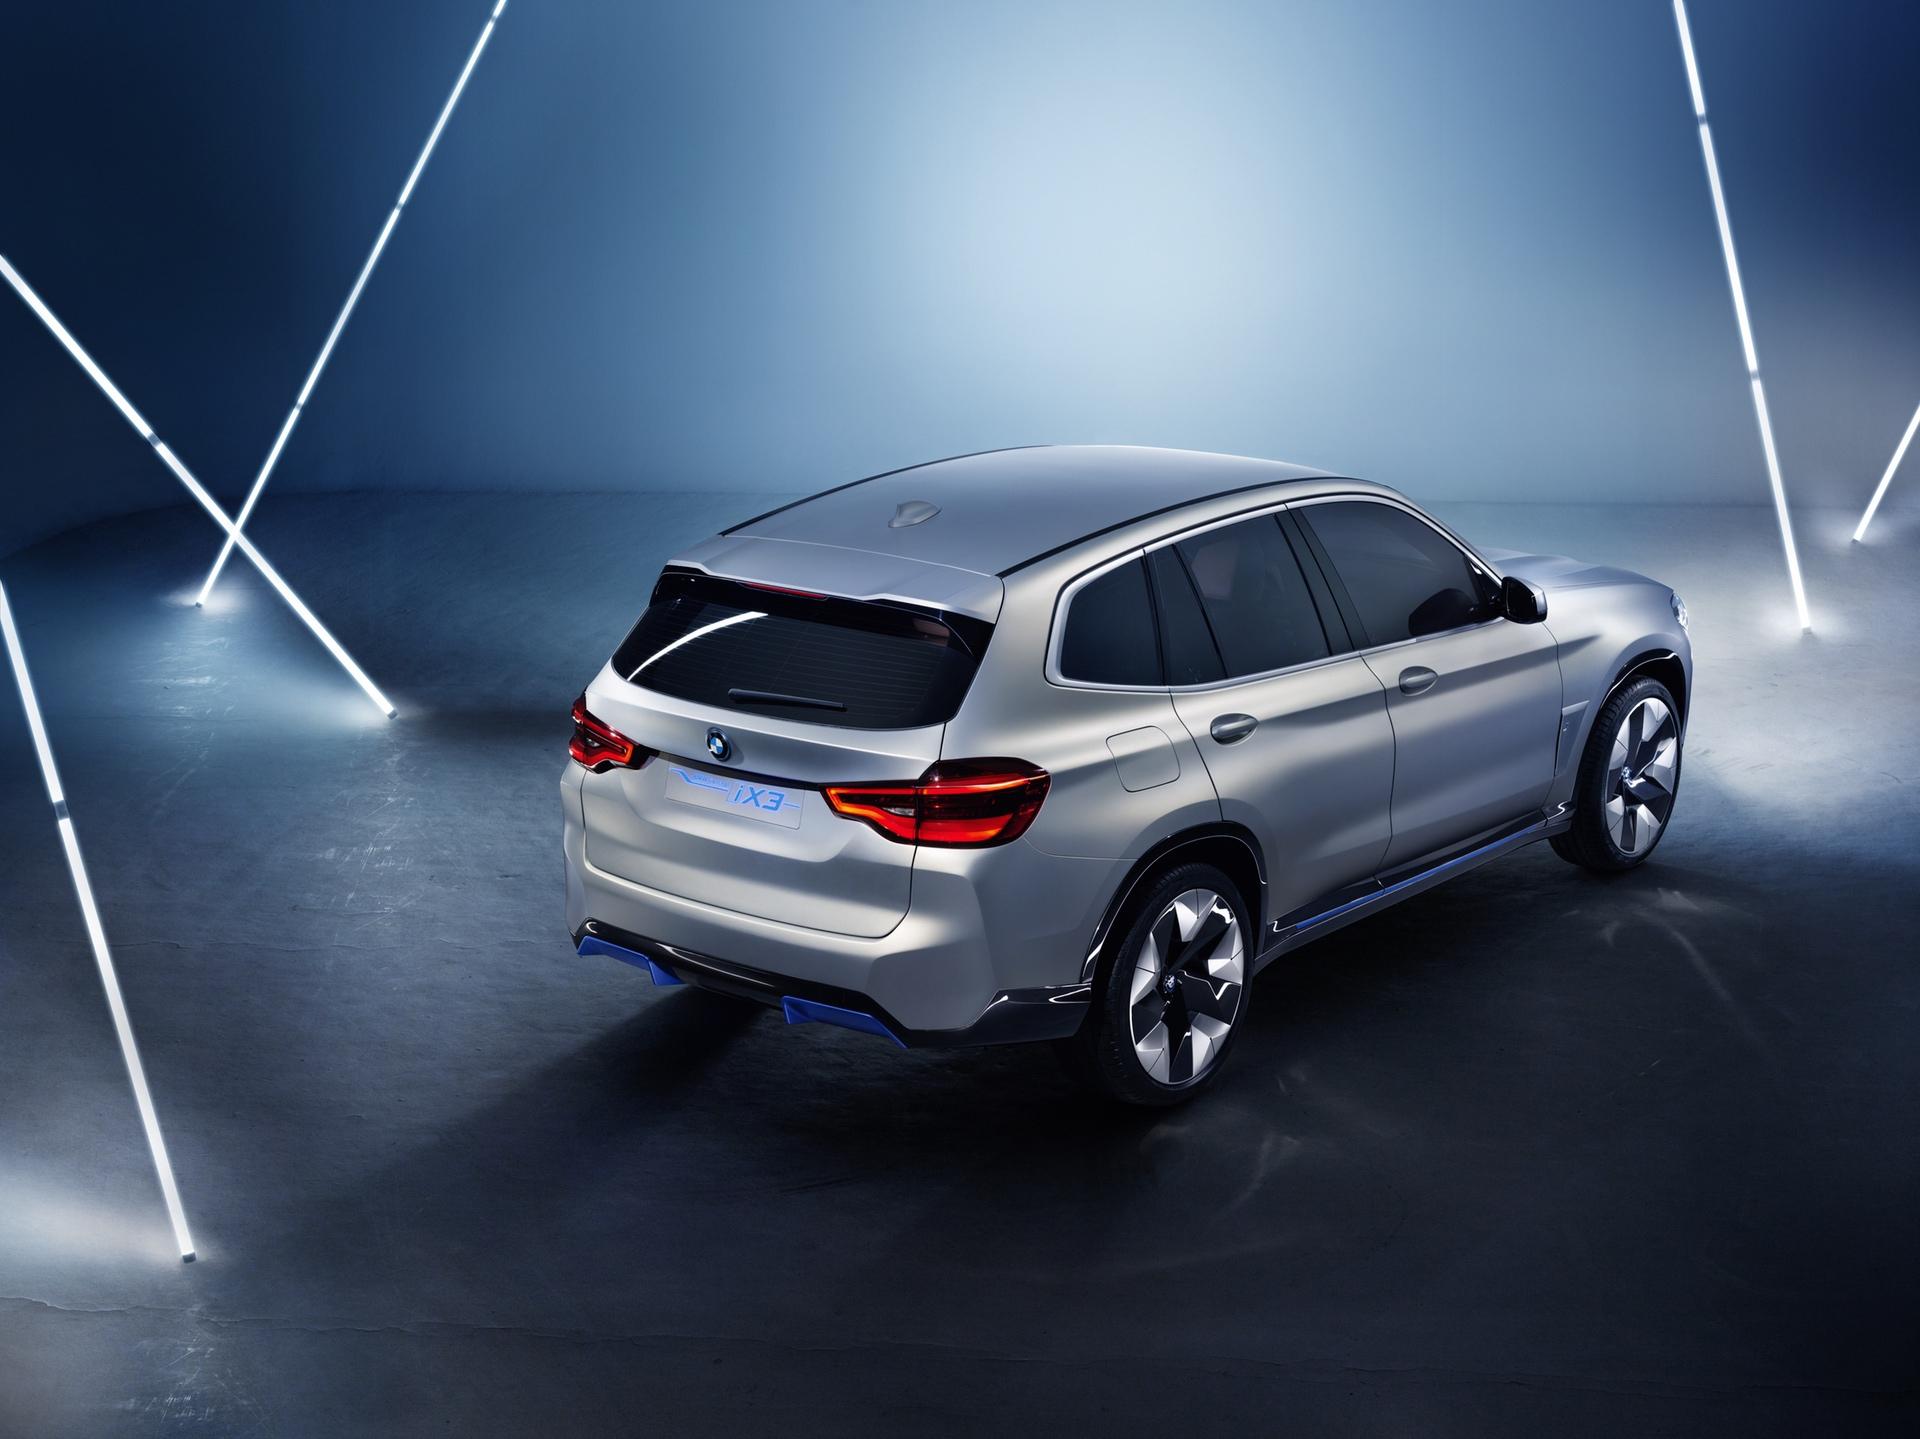 BMW_iX3_Concept_0004